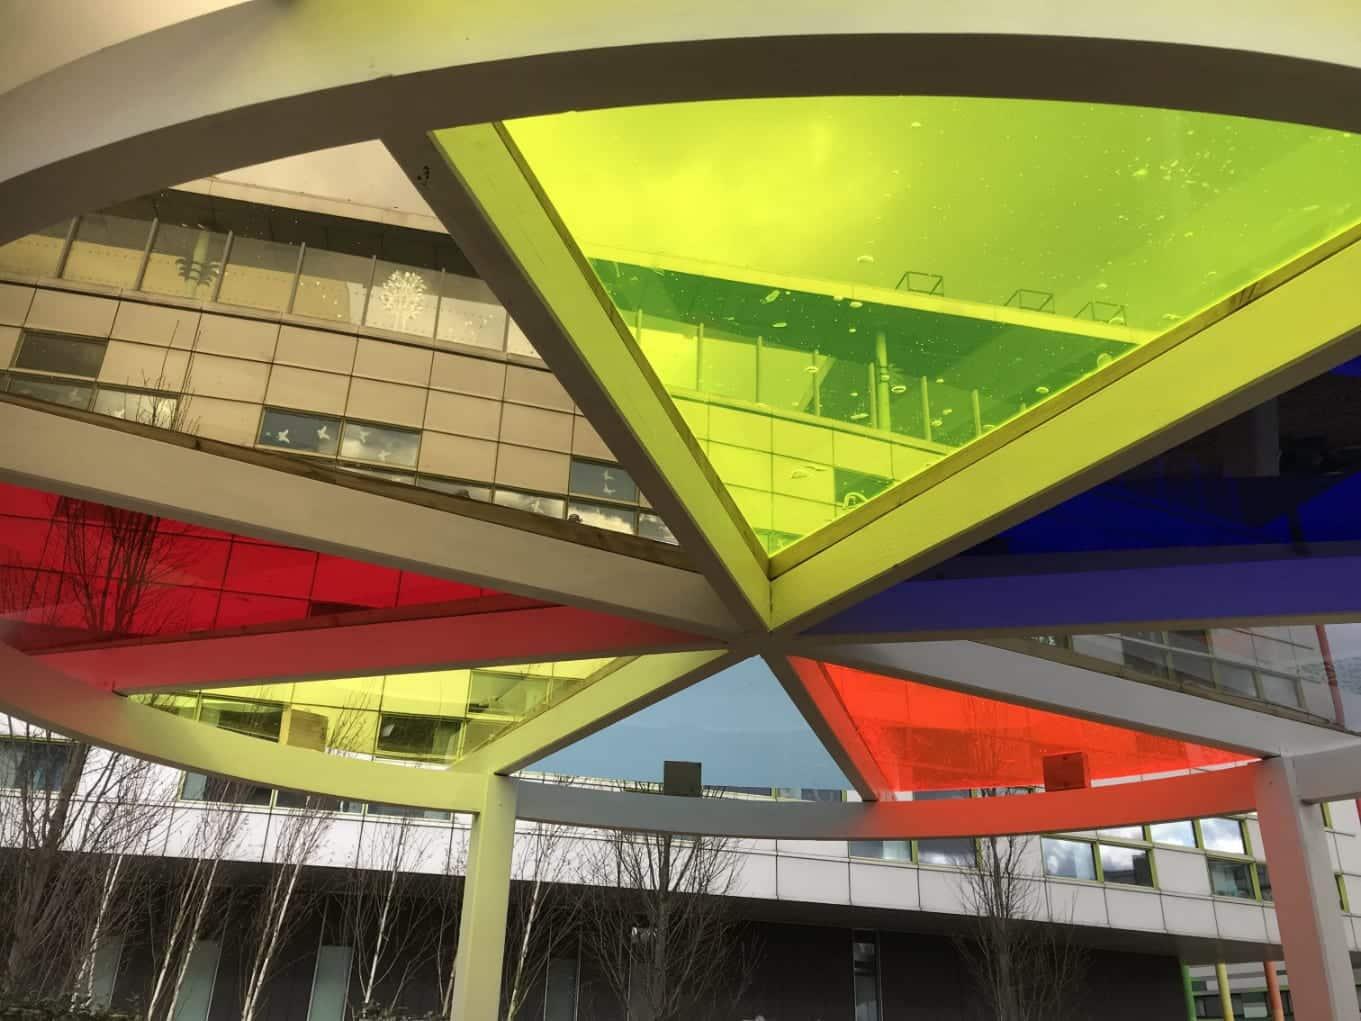 View through the canopy - full spectrum.